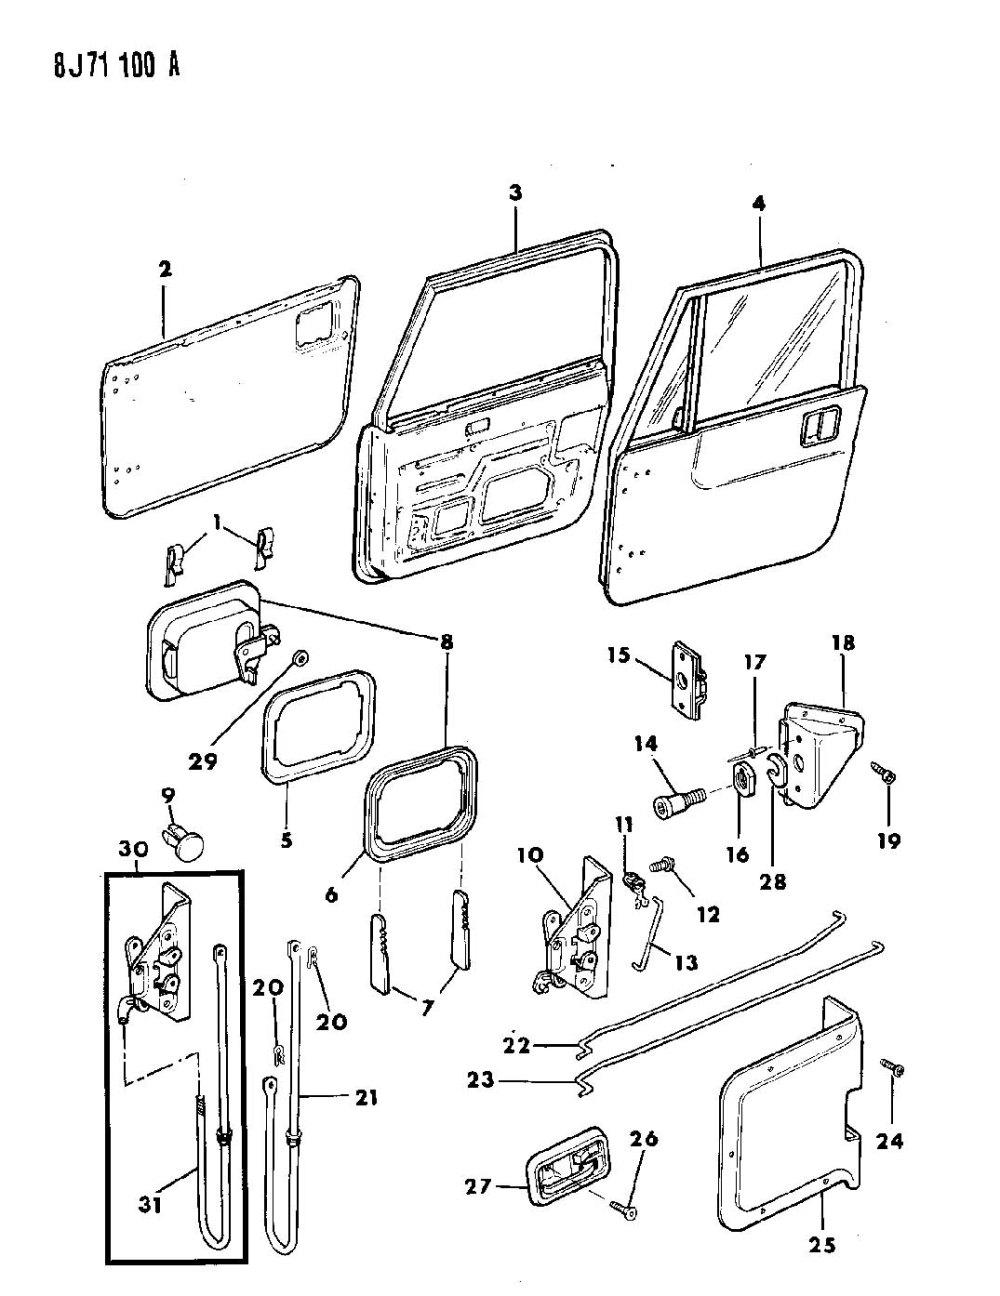 medium resolution of 2012 jeep wrangler steering column wiring diagram images gallery